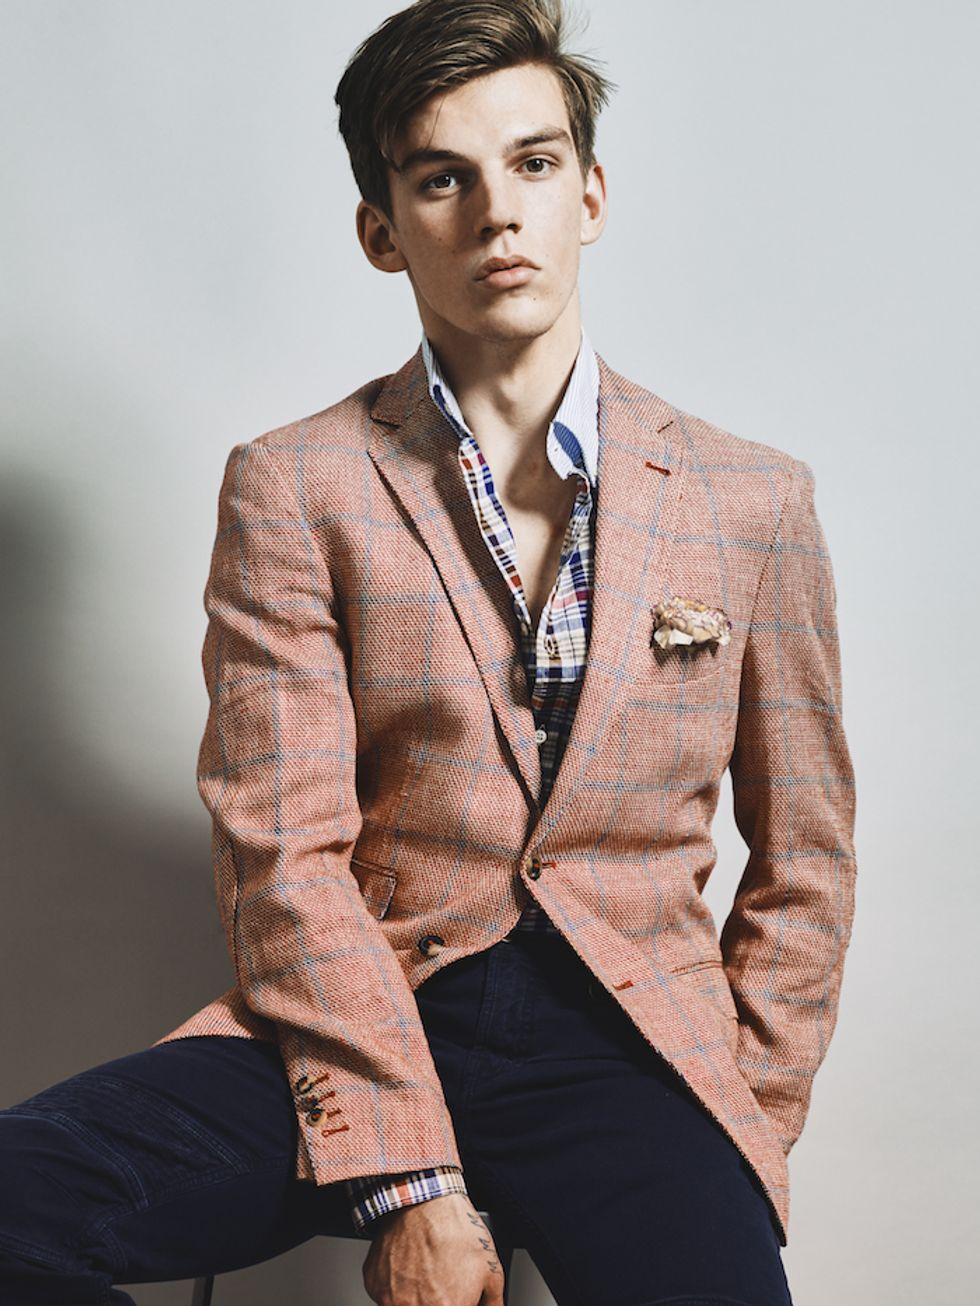 The New Royals: Meet Teenage Model Miles Hurley